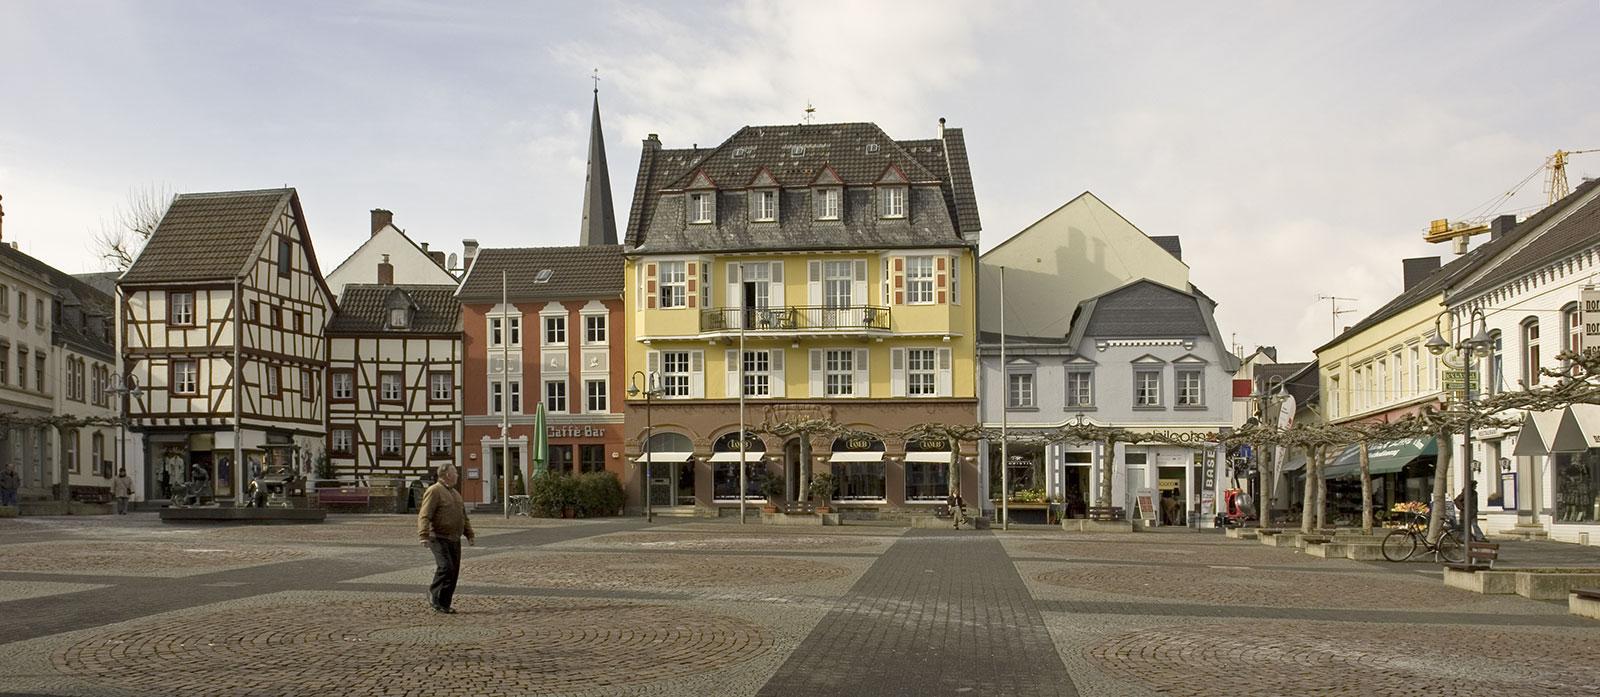 Lange saunanacht euskirchen